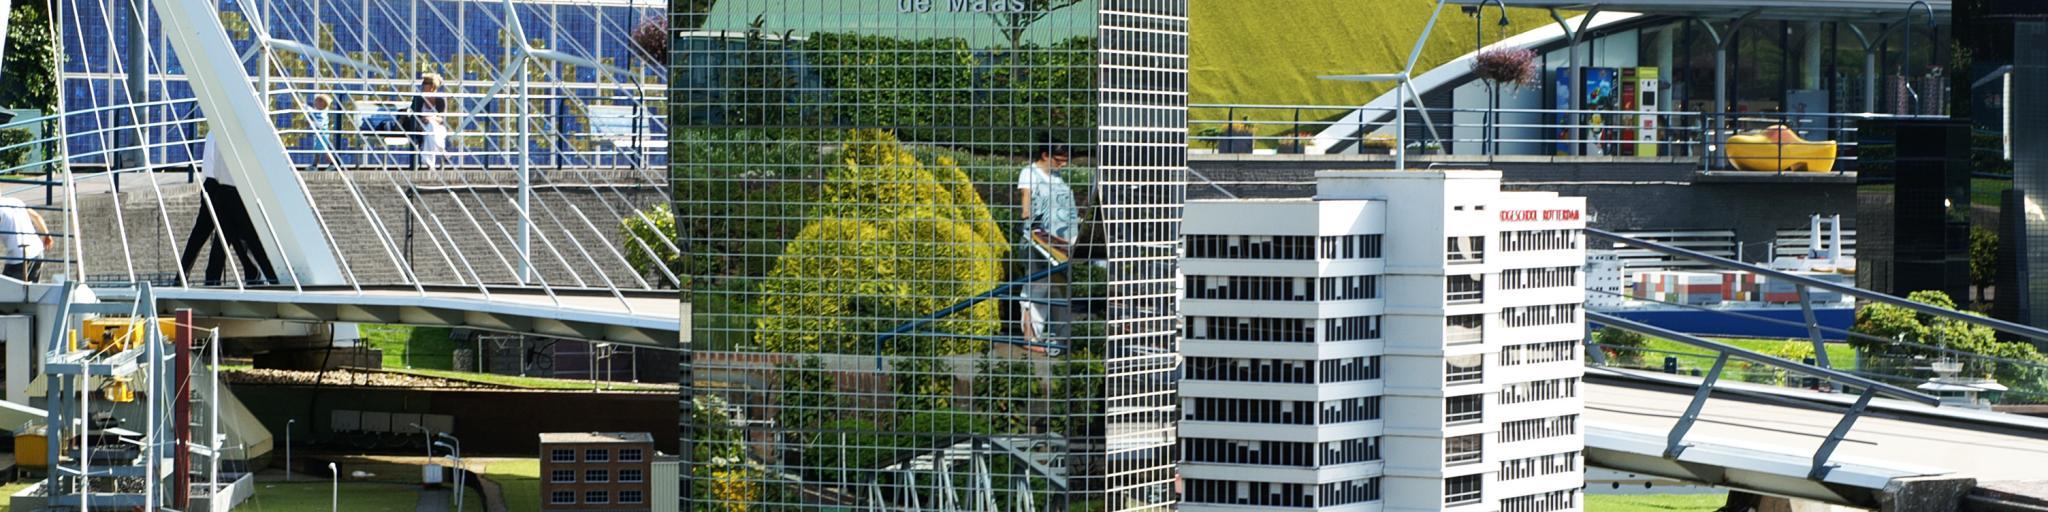 Miniature replicas of city buildings, bridges and railways draw visitors to the Hague's Madurodam park